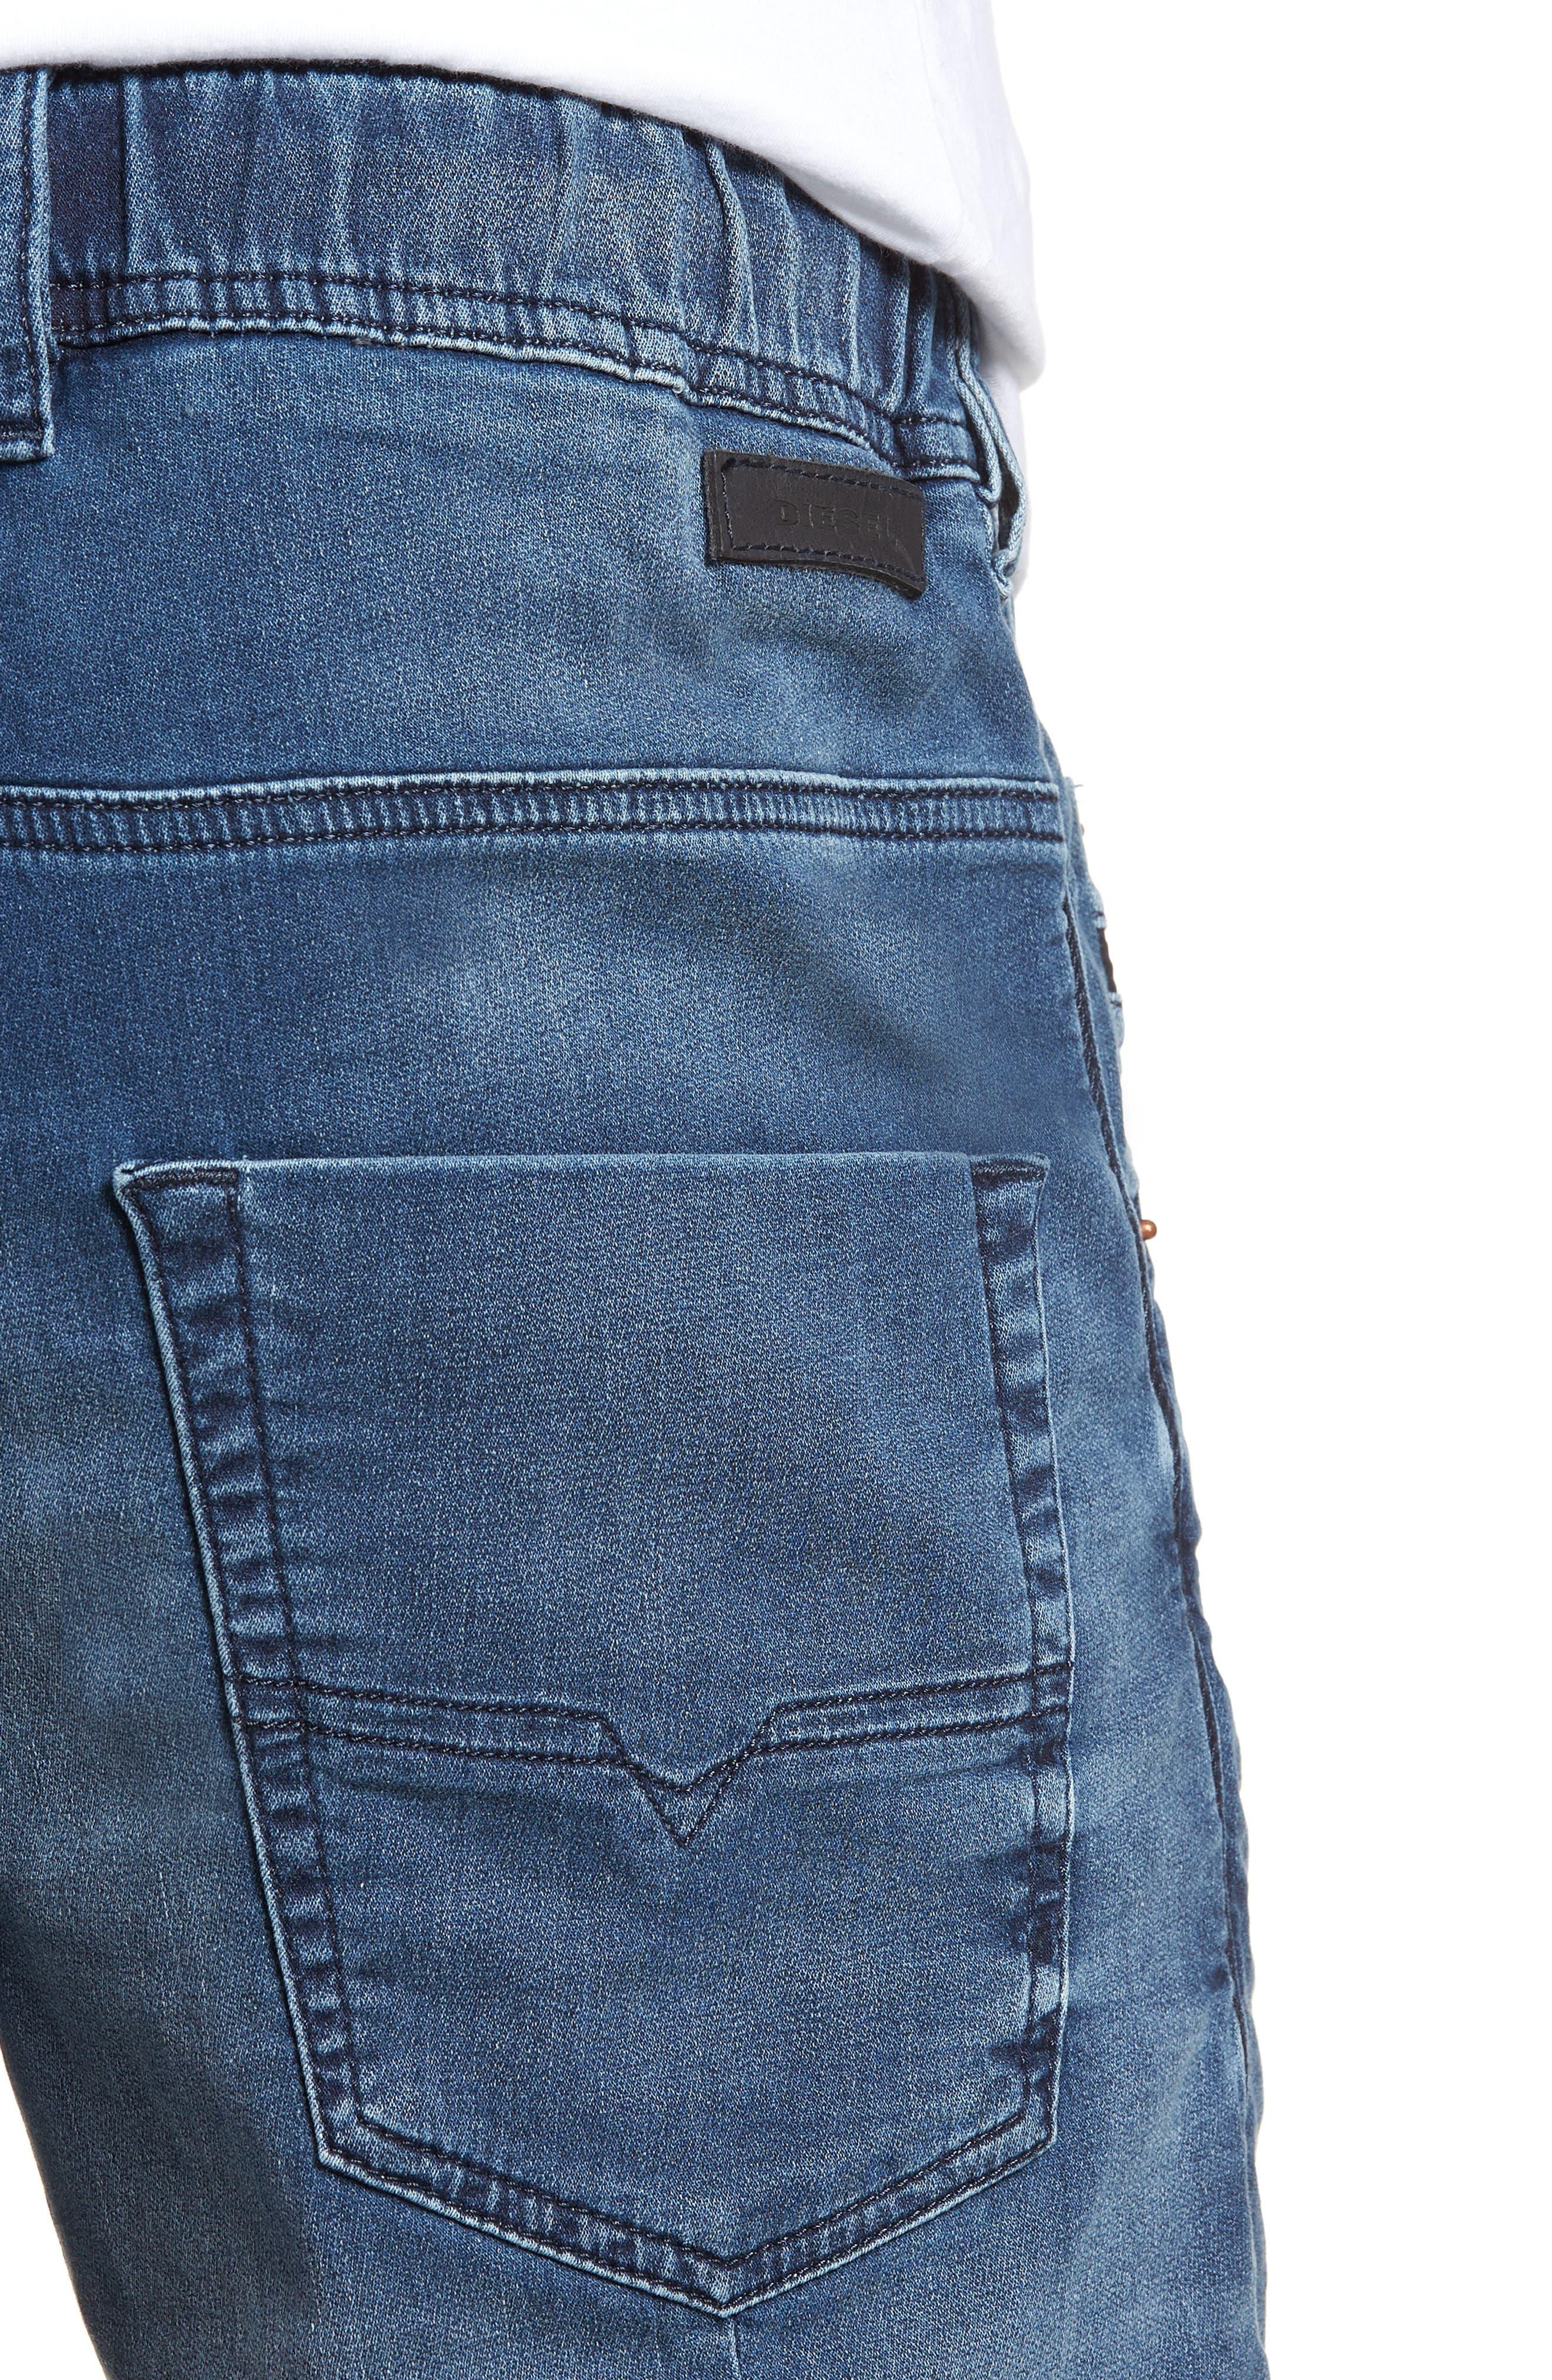 Krooshort Denim Shorts,                             Alternate thumbnail 4, color,